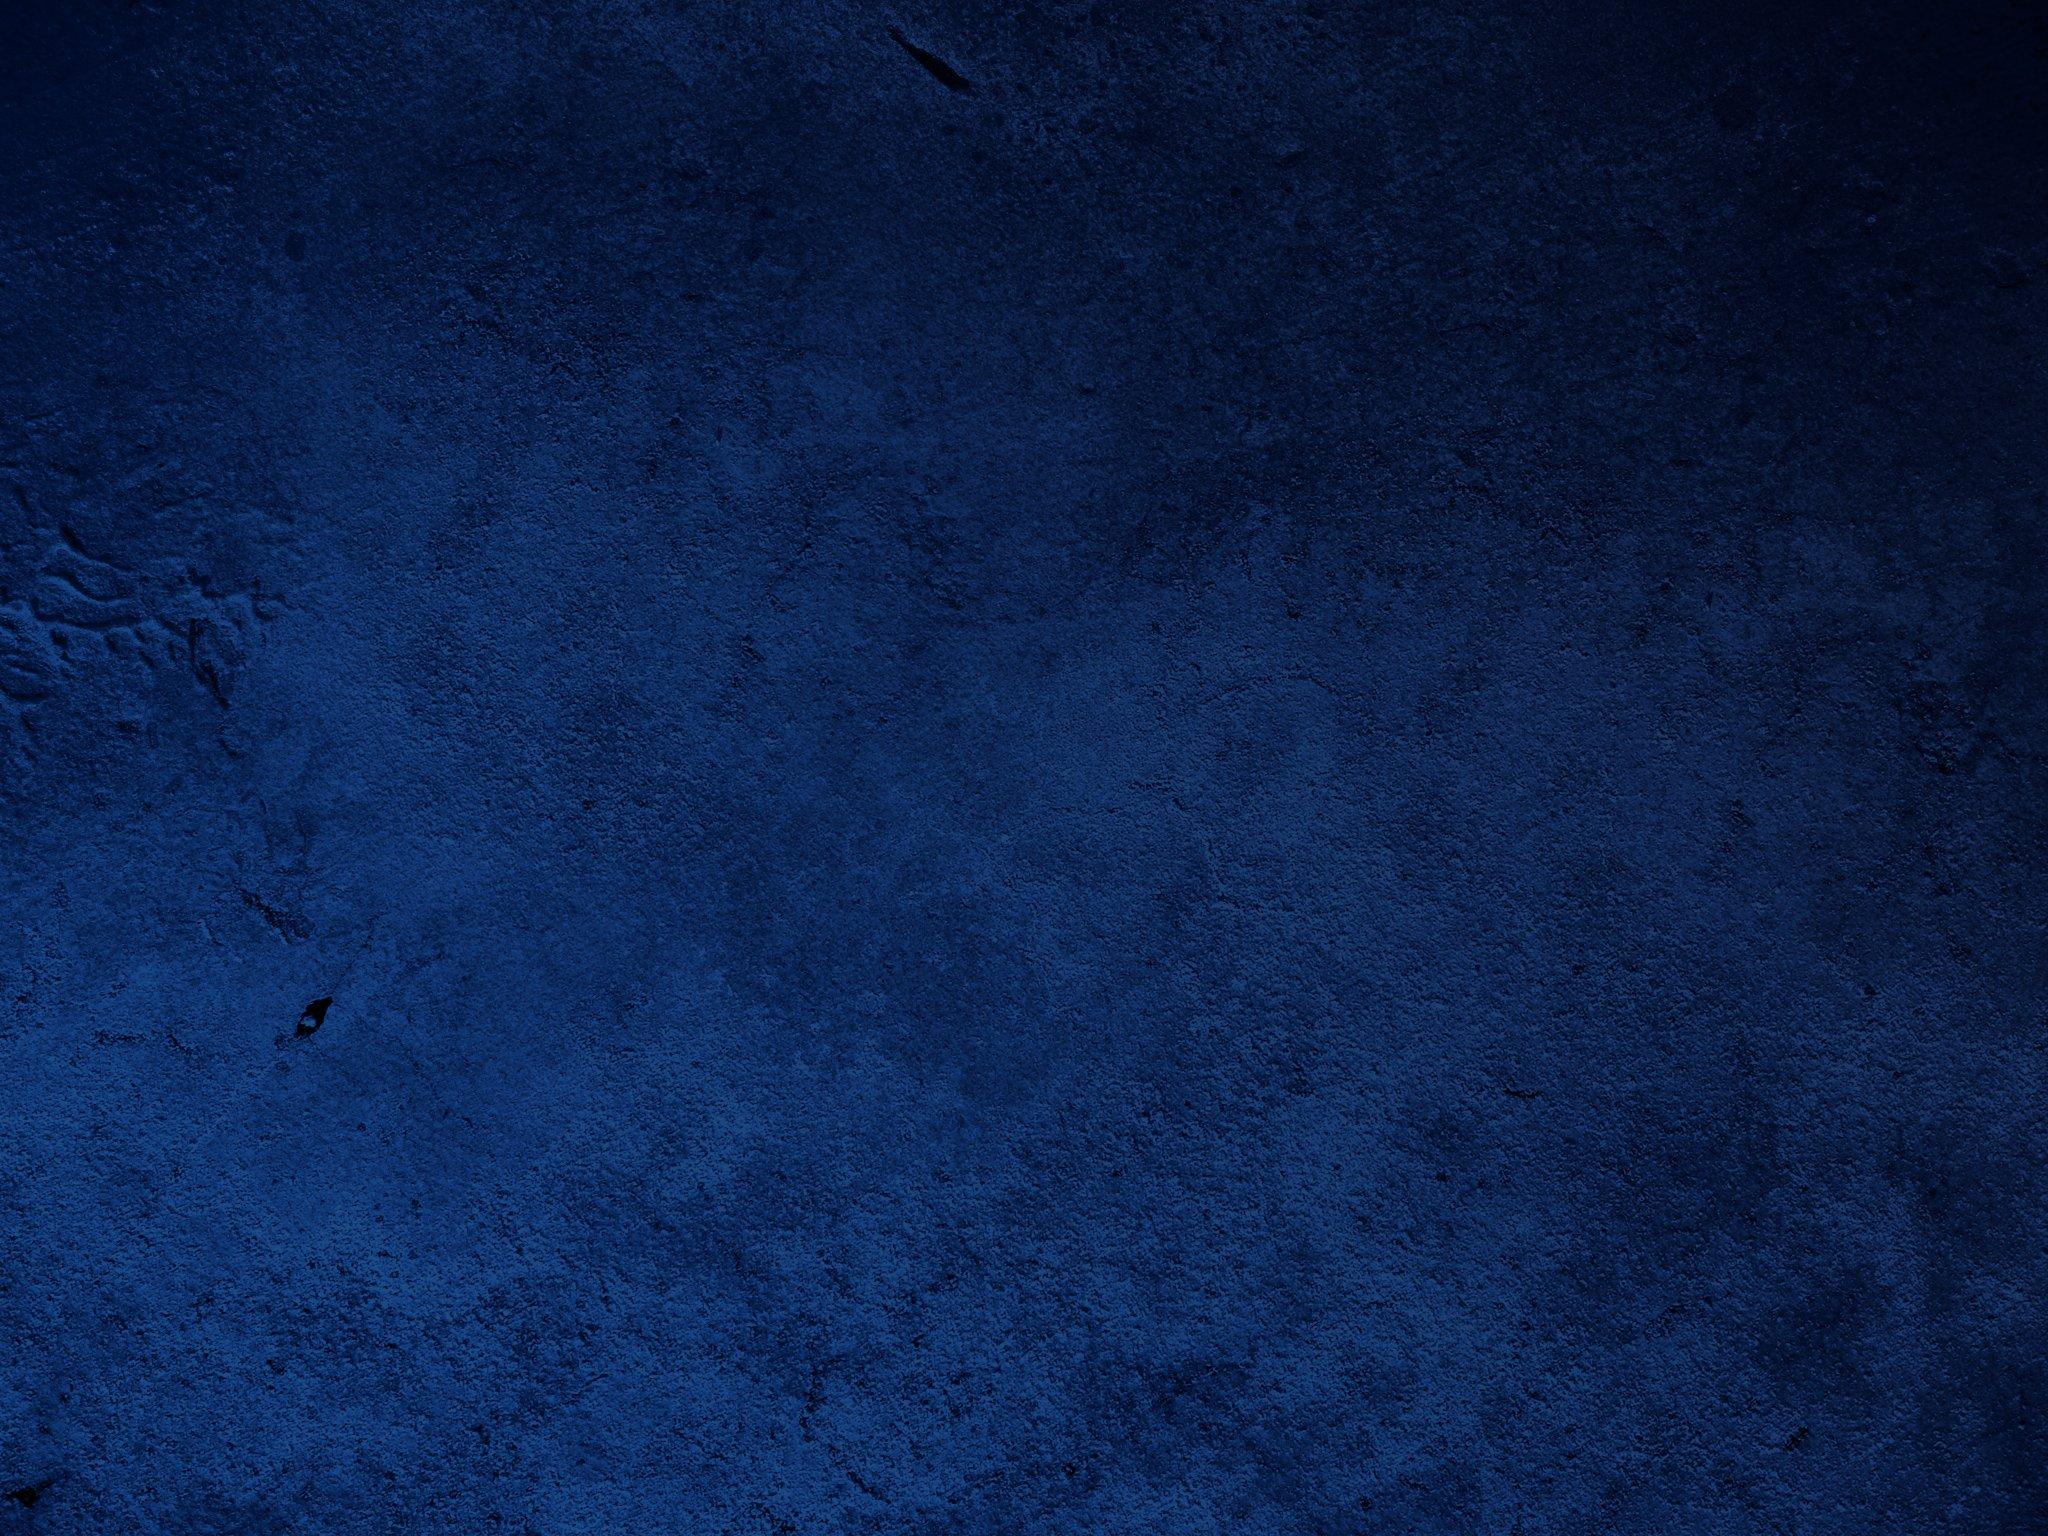 Blue Texture Wallpaper WallpaperSafari